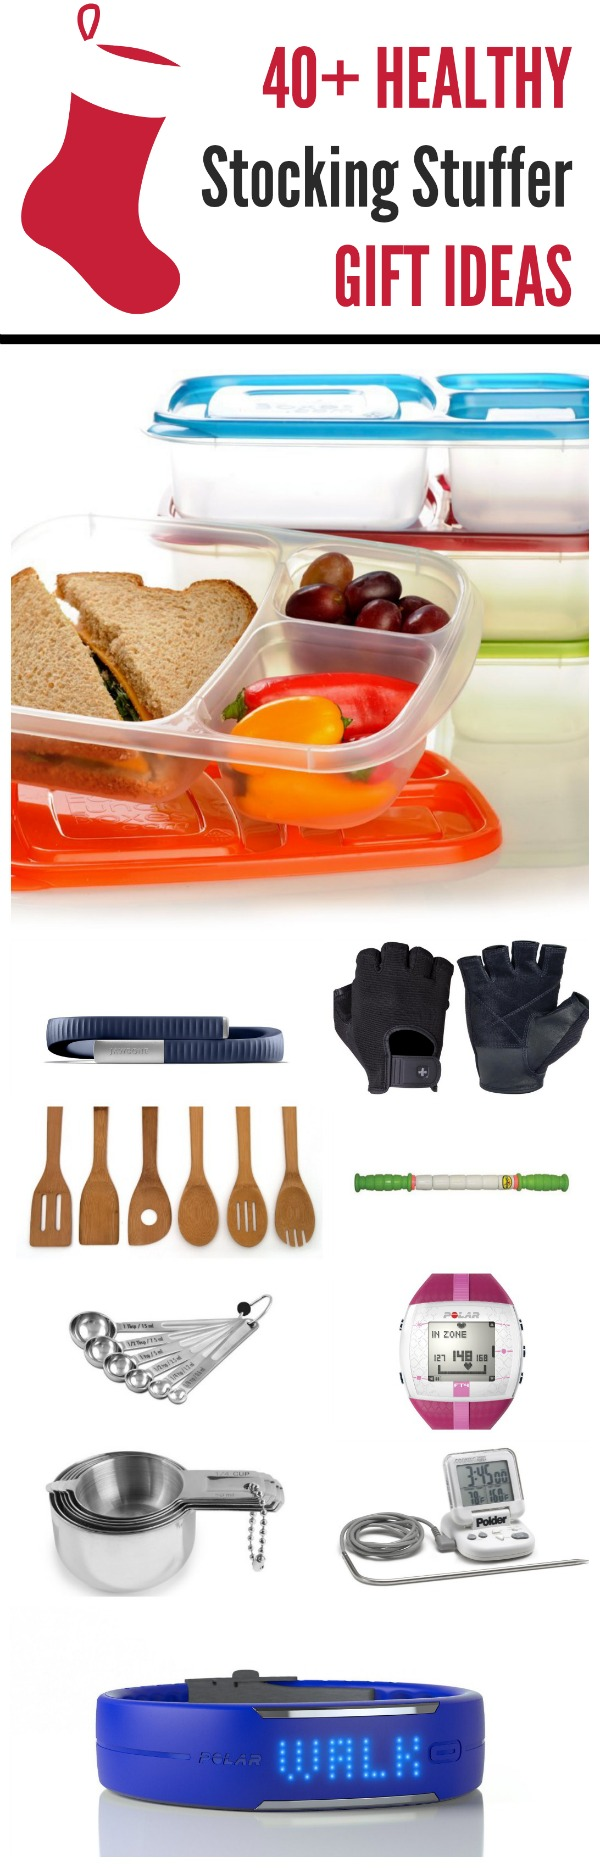 40 + healthy stocking stuffer gift ideas